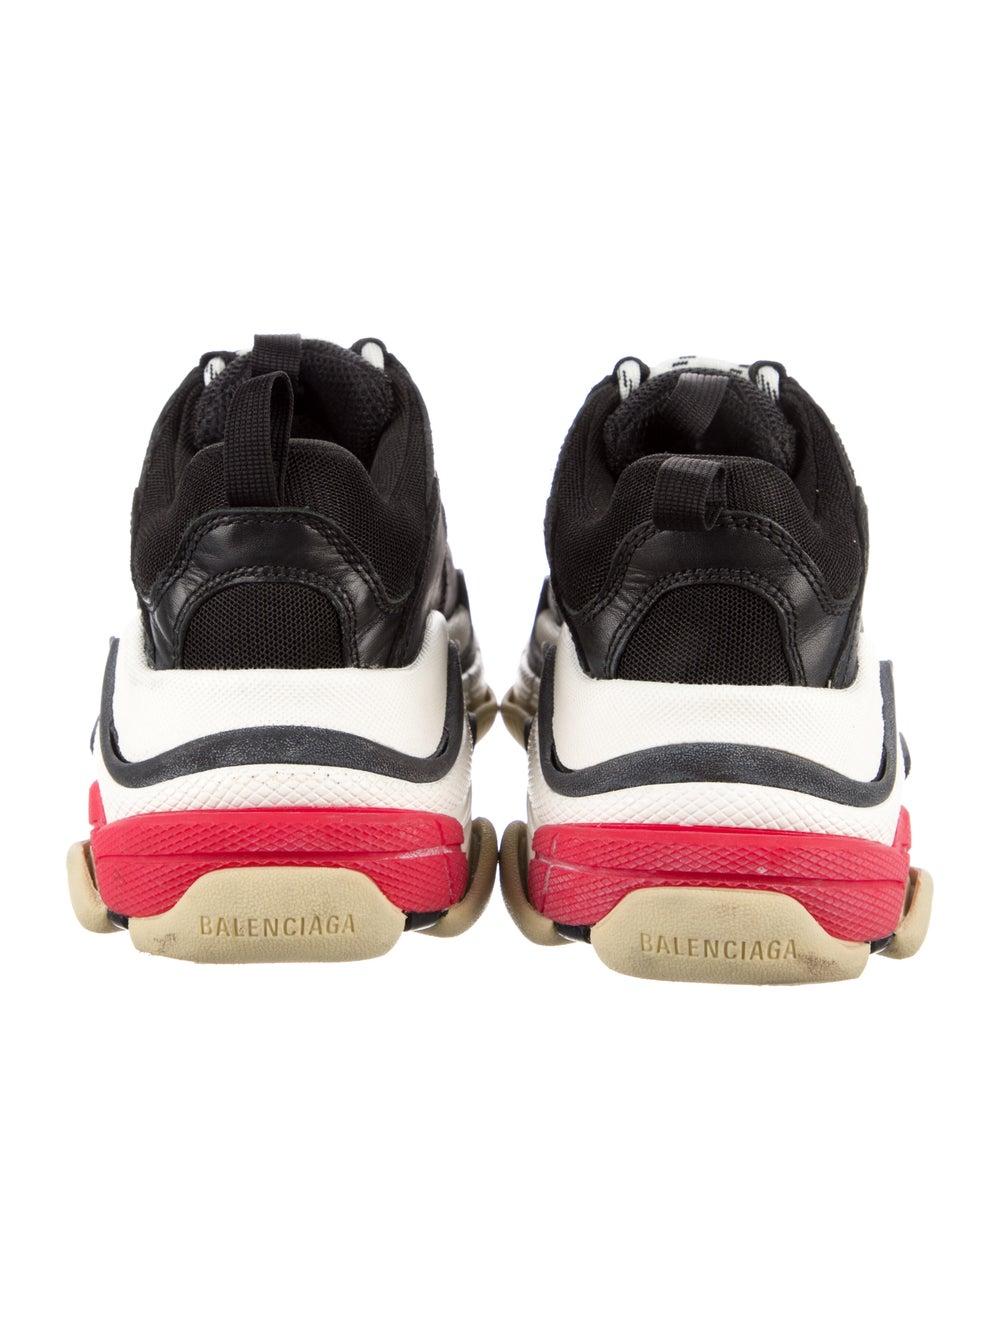 Balenciaga Triple S Sneakers Chunky Sneakers Black - image 4